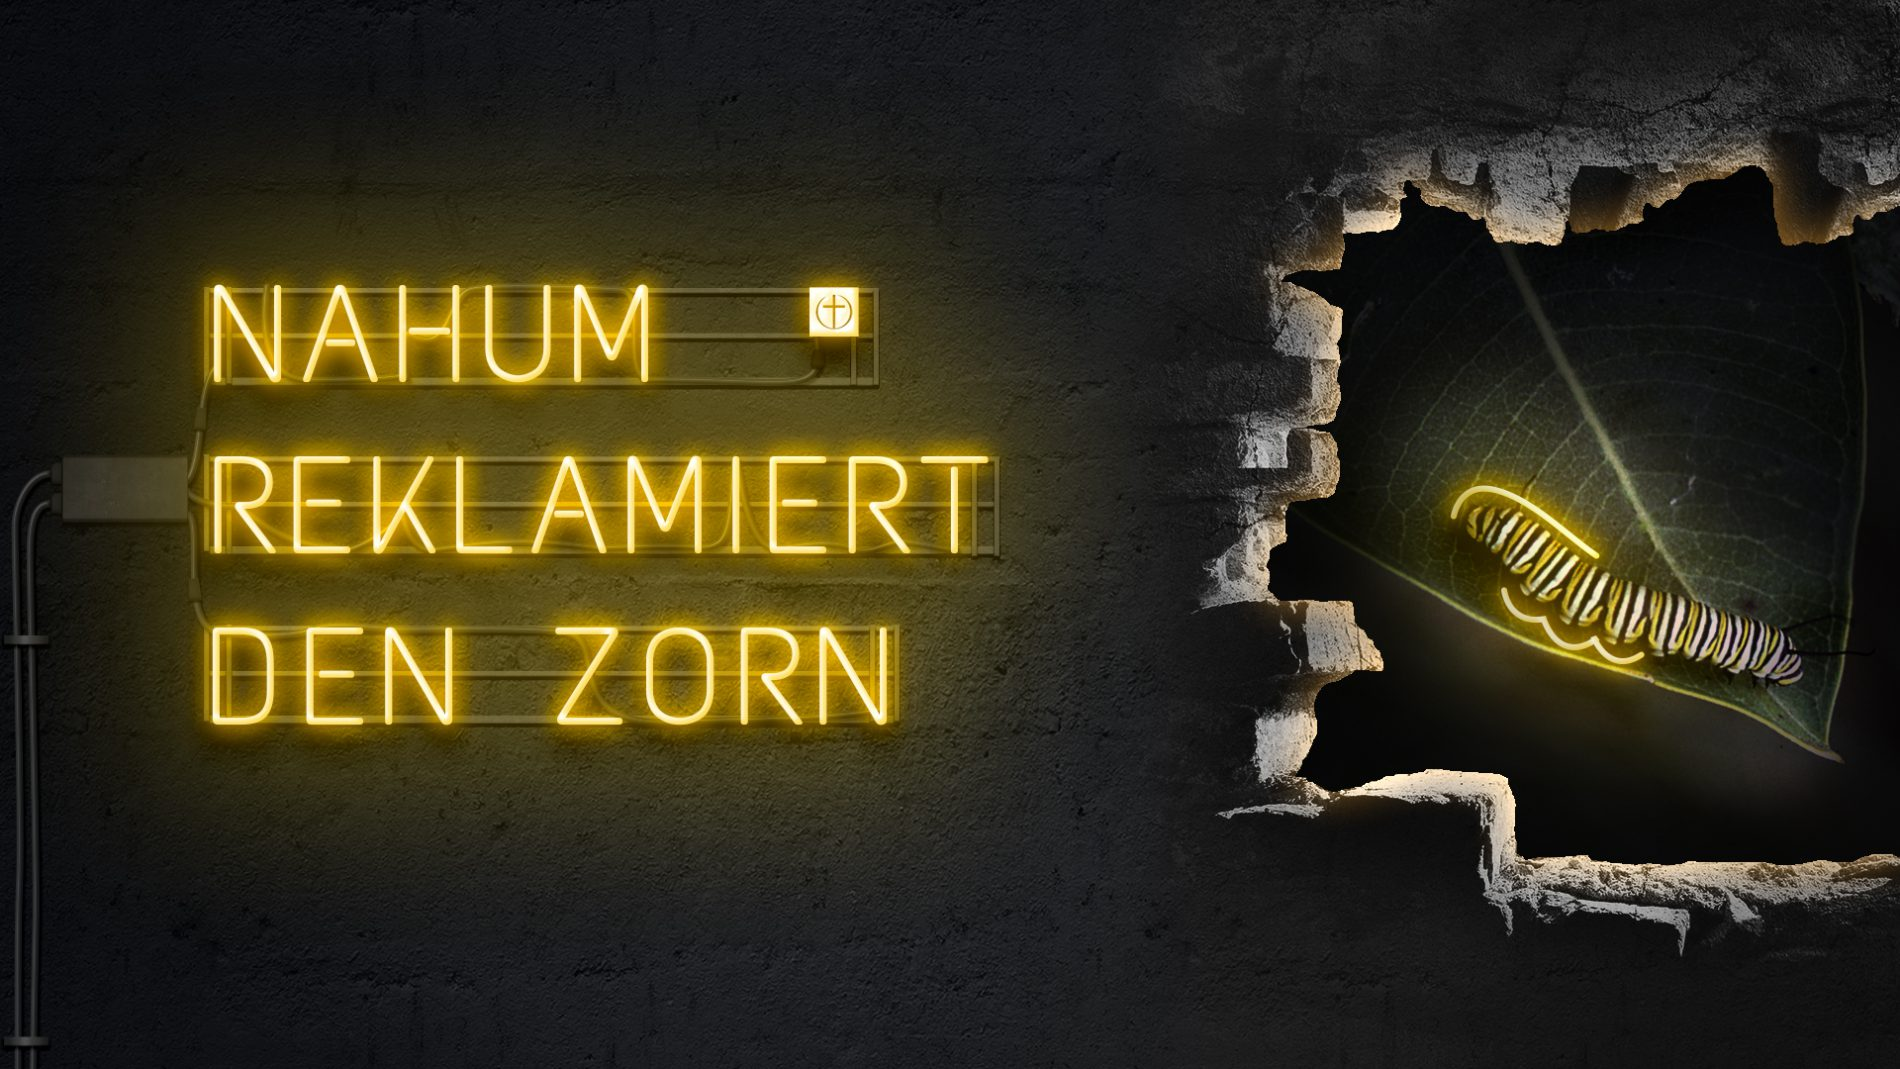 Nahum reklamiert den Zorn (Zwölf Propheten VII)